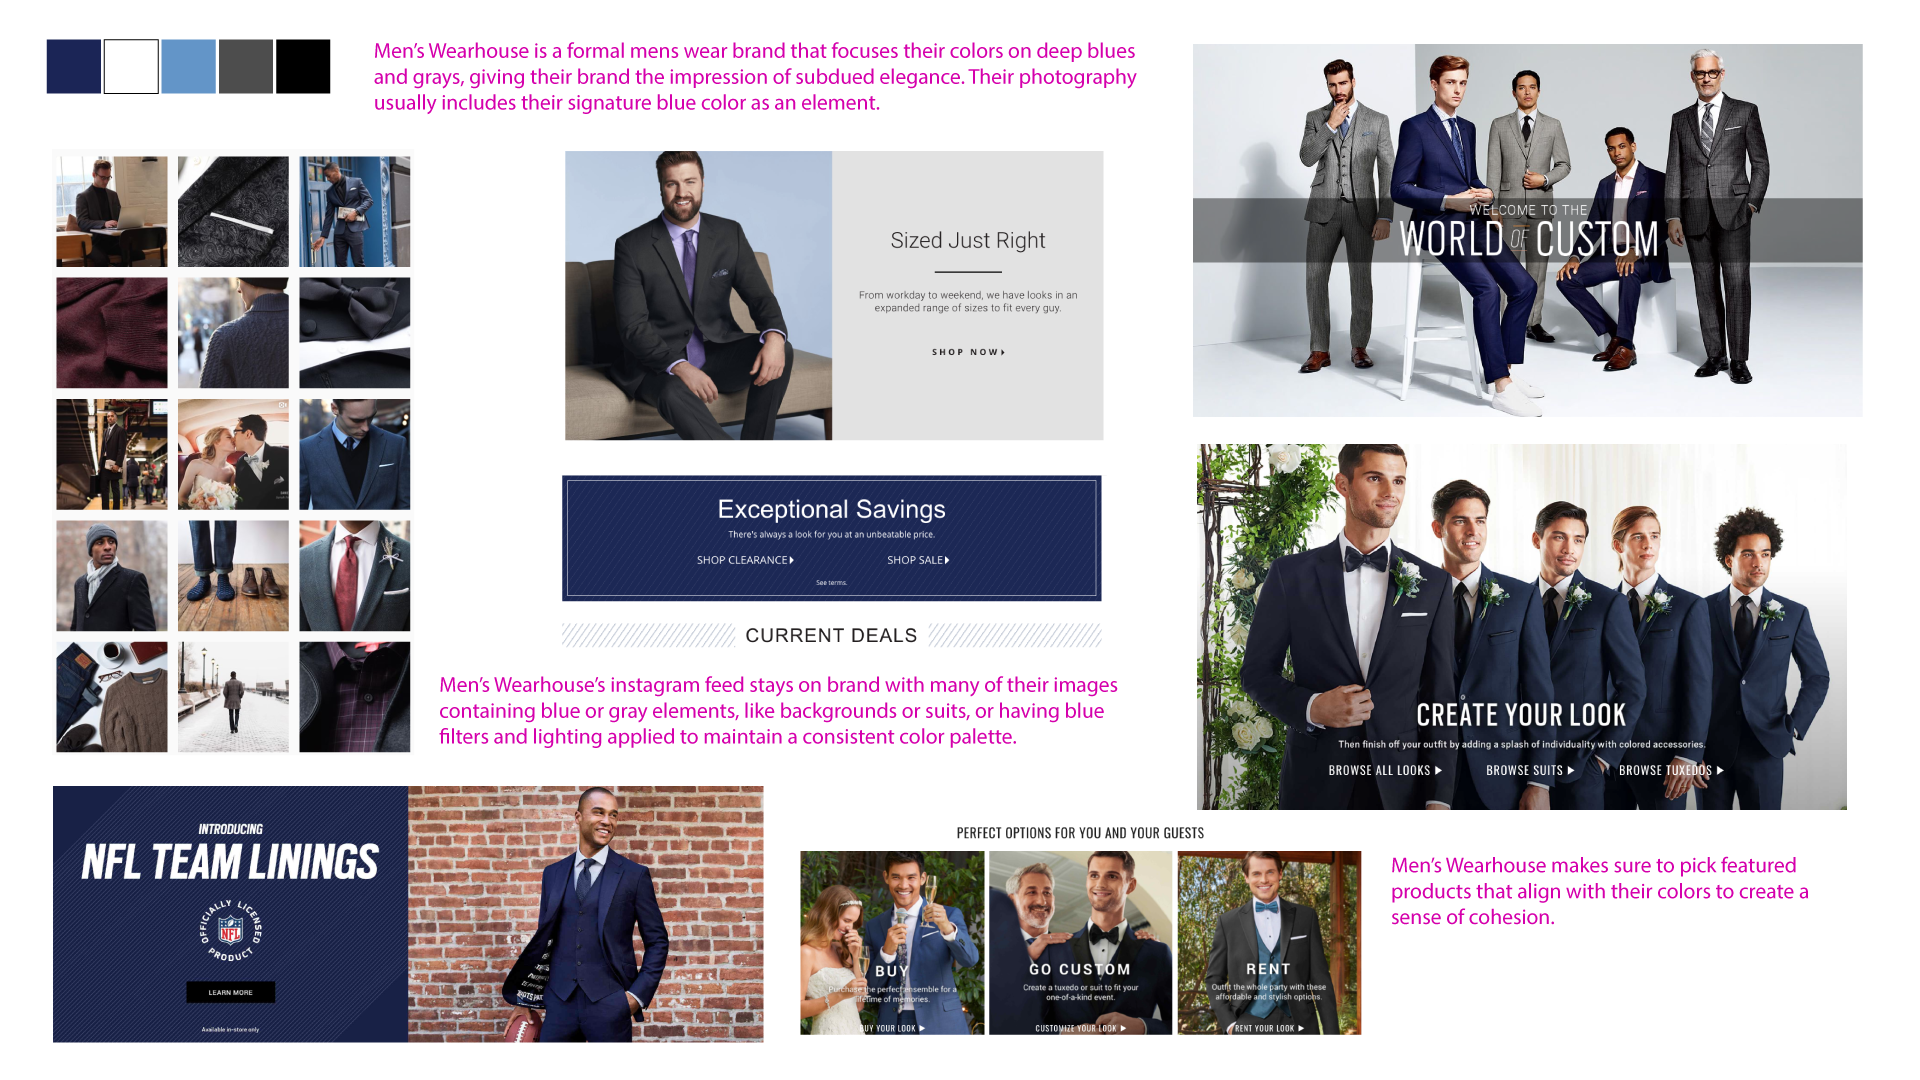 Men's Wearhouse brand color palette and website design